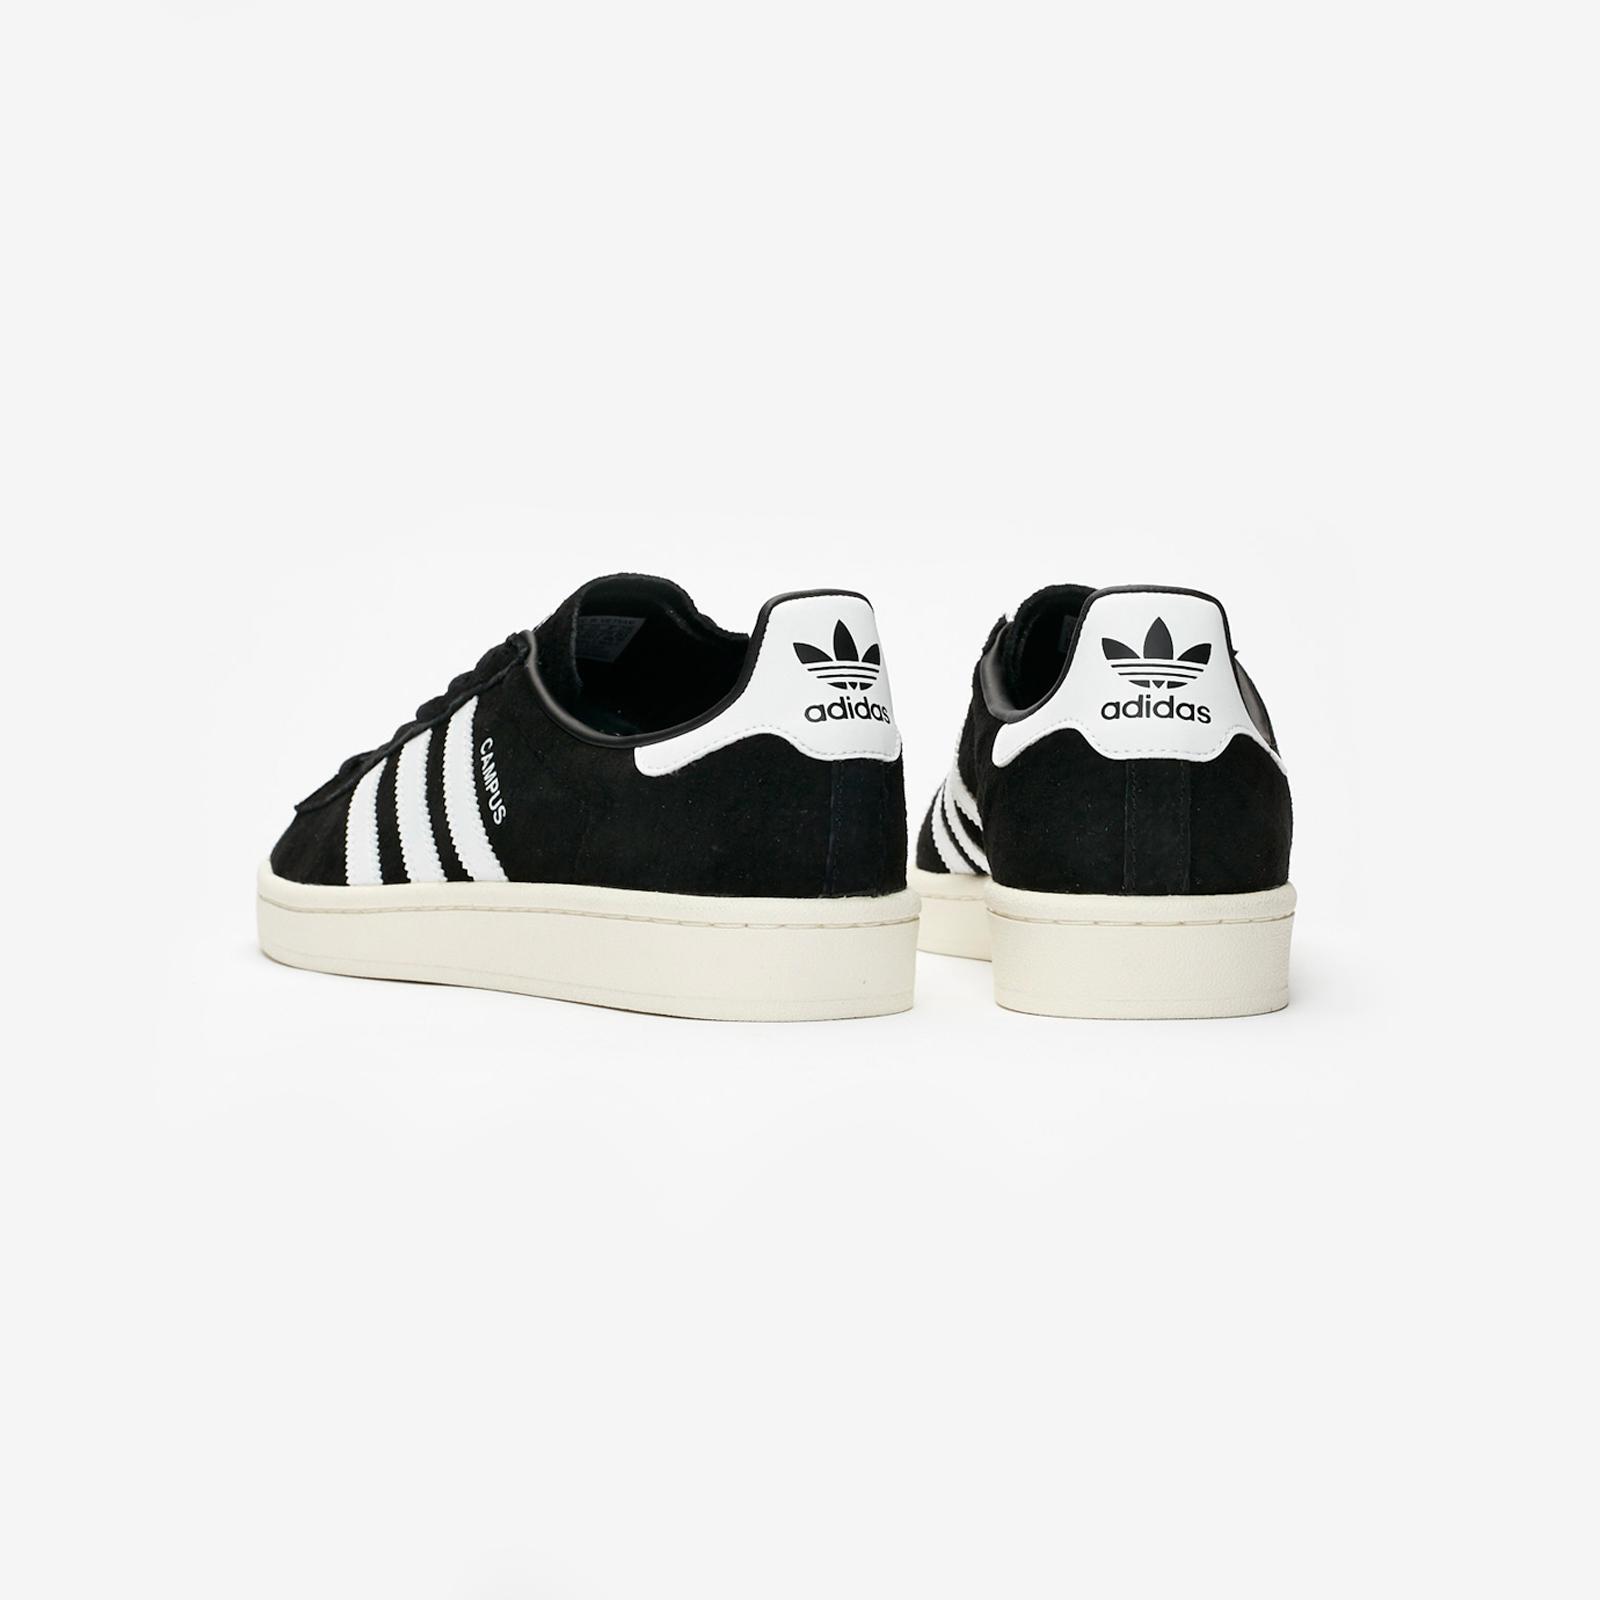 adidas Campus - Bz0084 - Sneakersnstuff